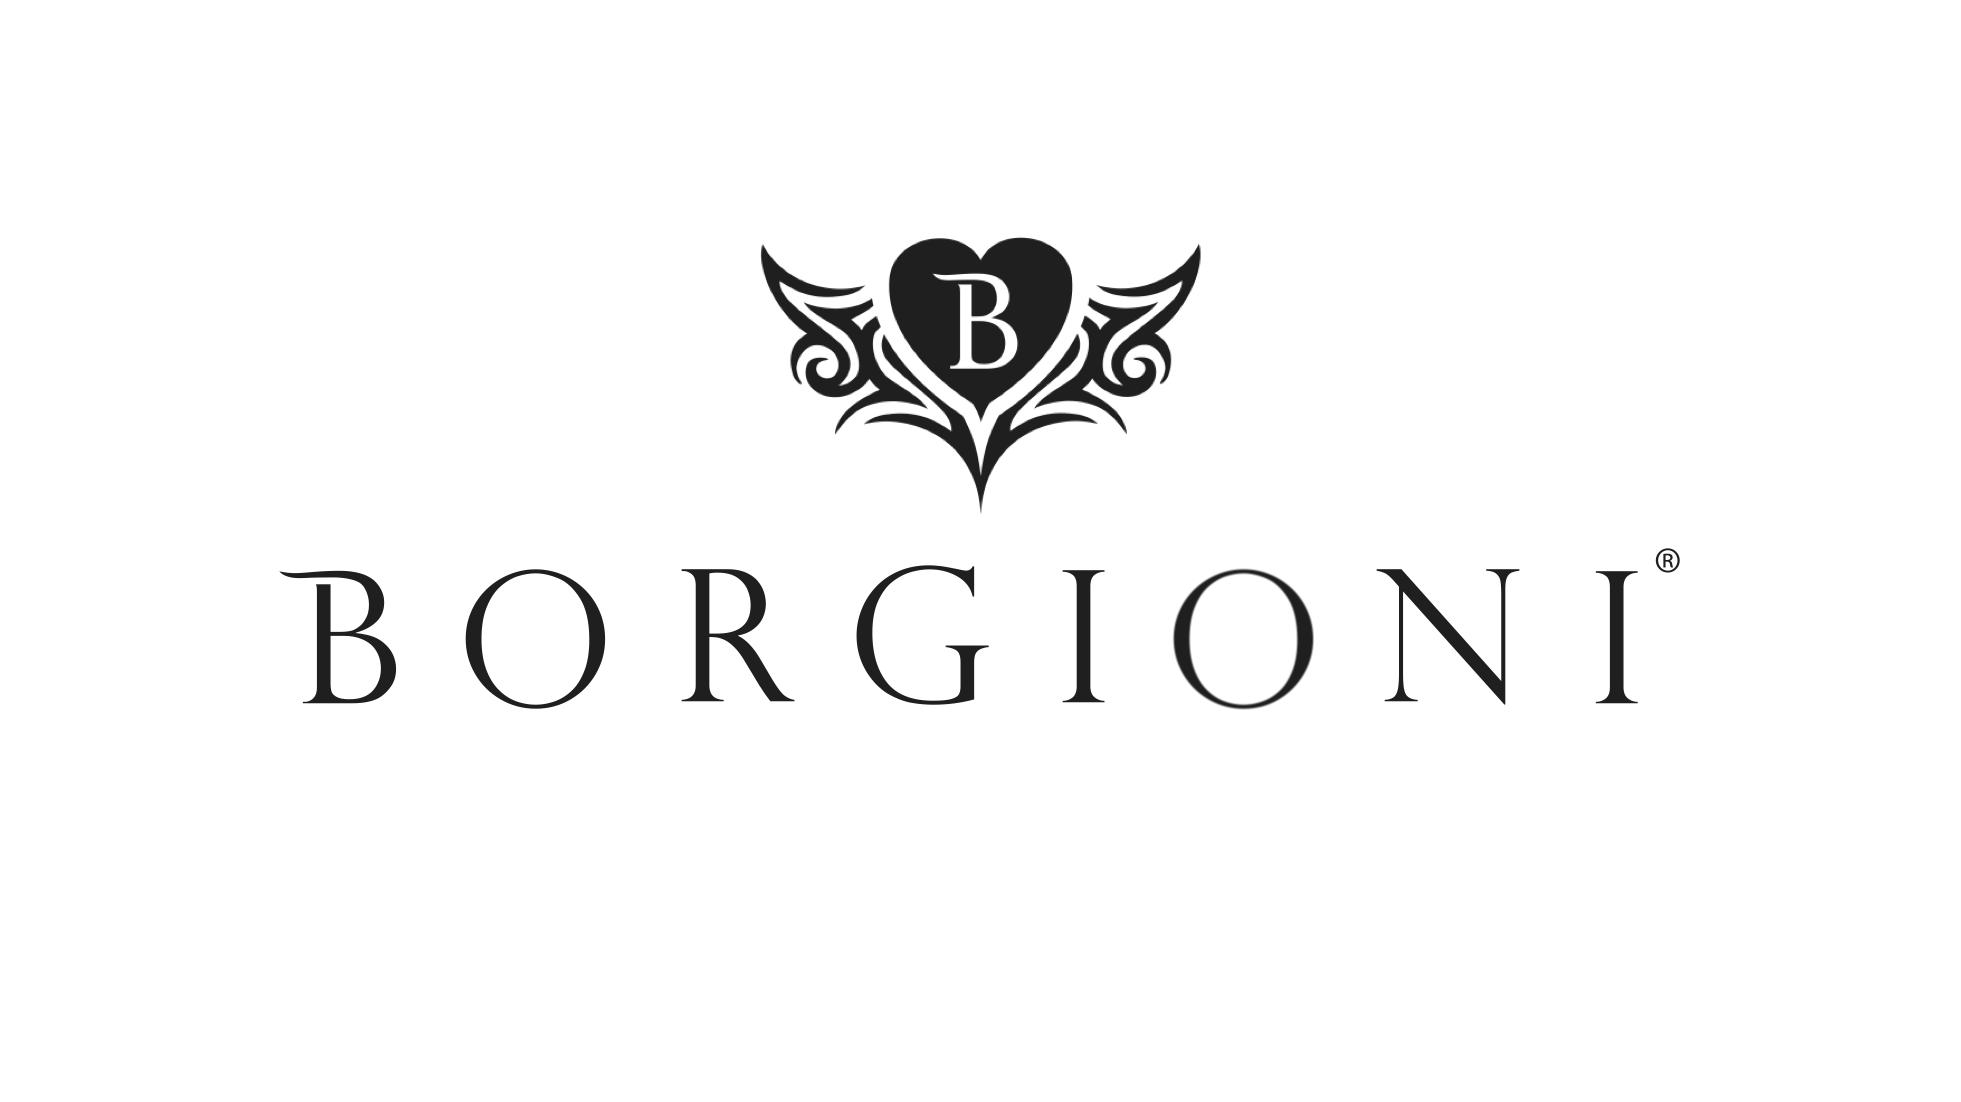 Borgioni Jewelry